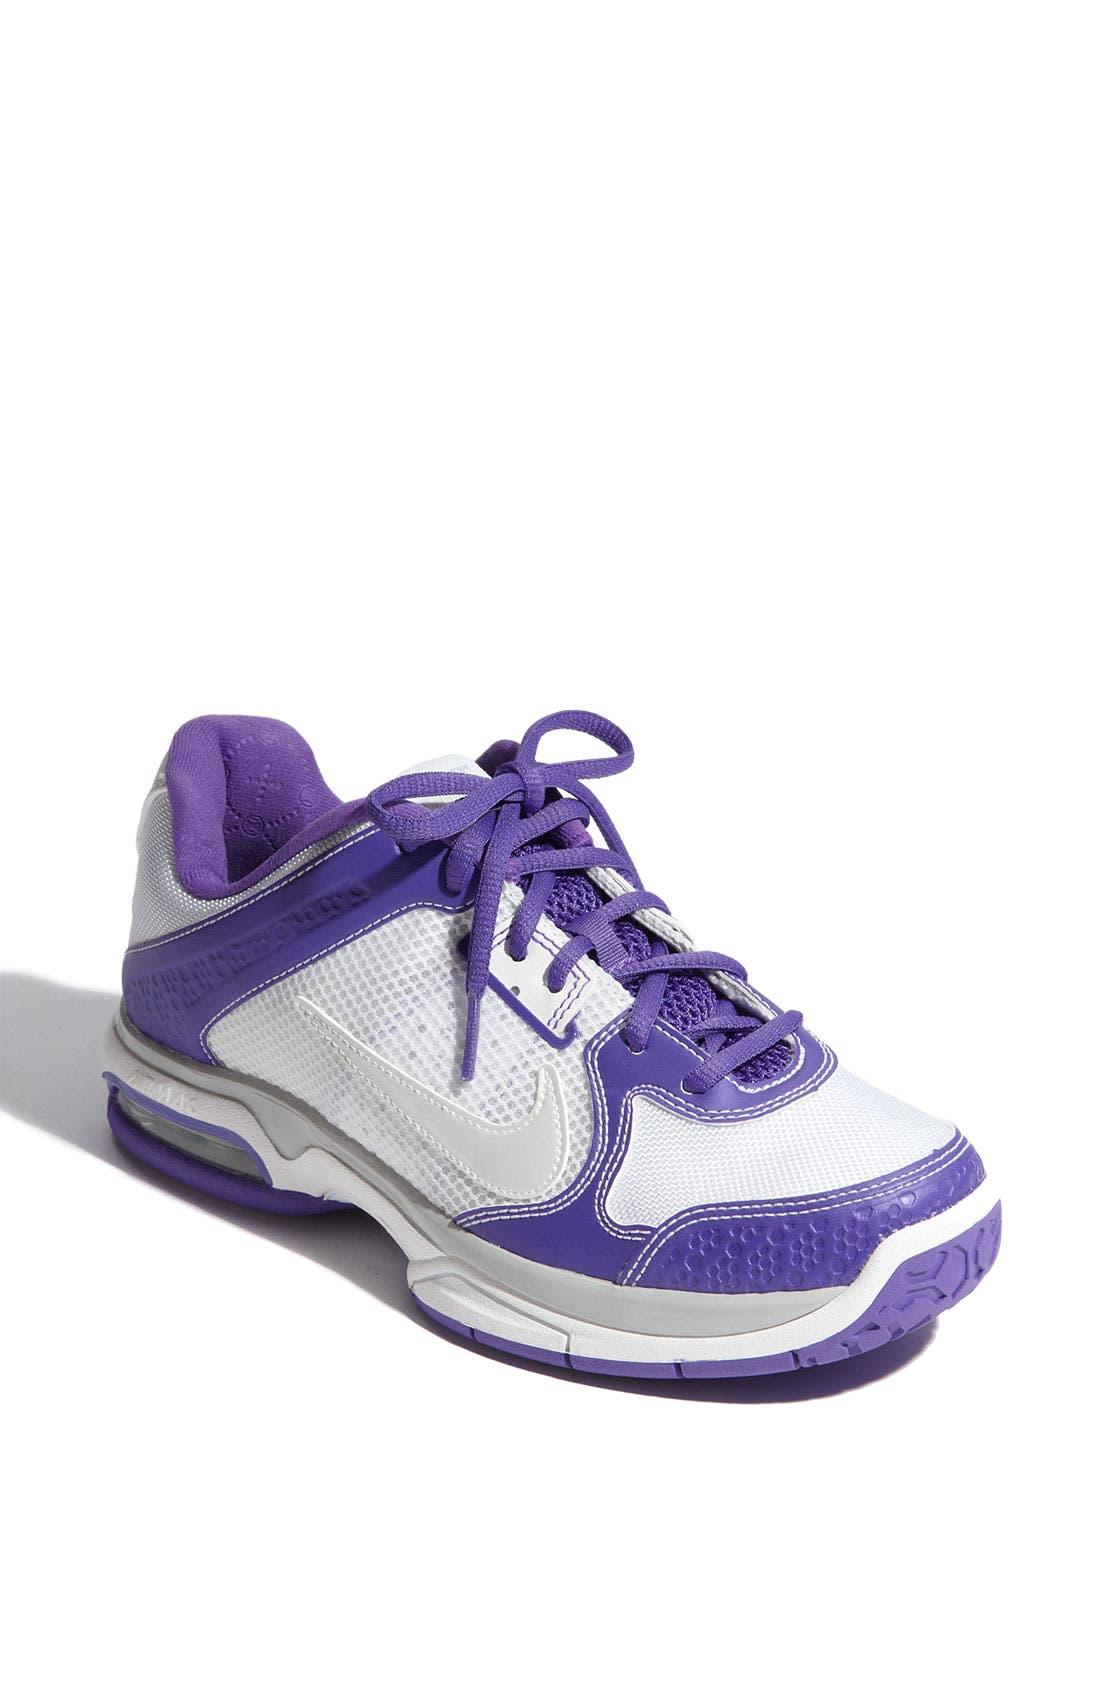 Main Image - Nike 'Air Max Mirabella 3' Tennis Shoe (Women)